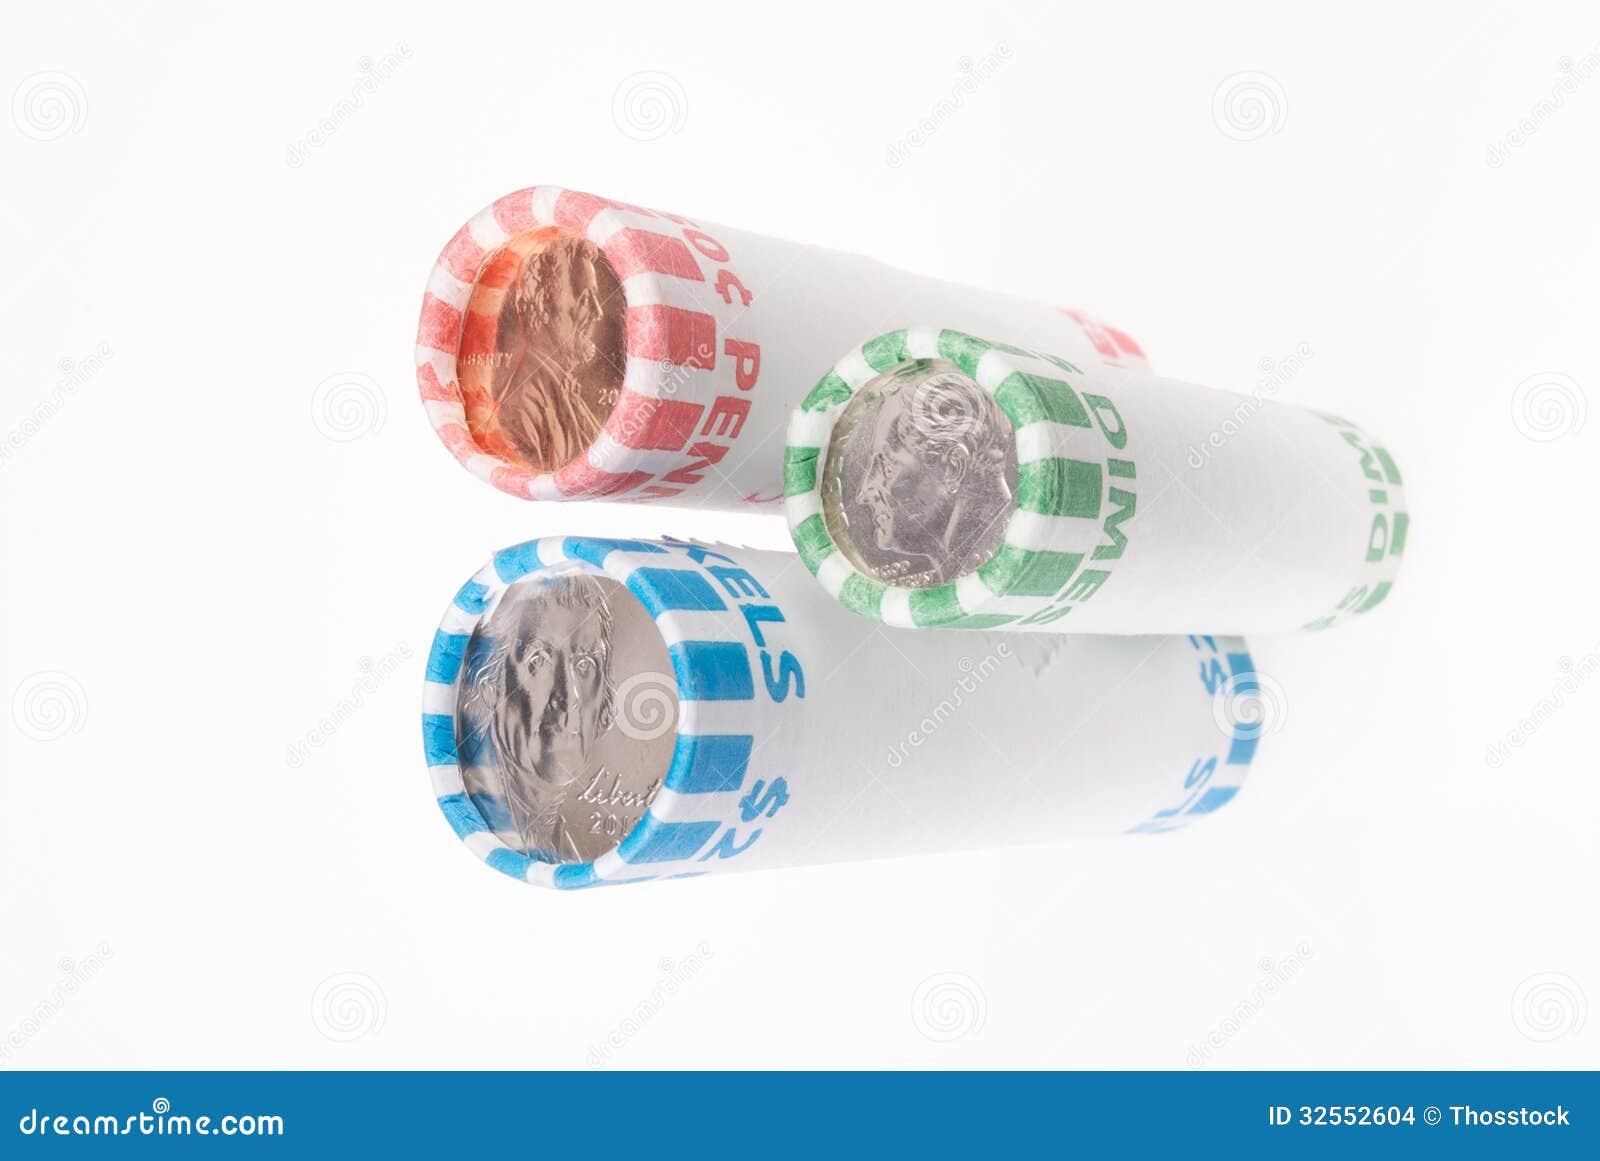 Penny Nickel Dime Rolls